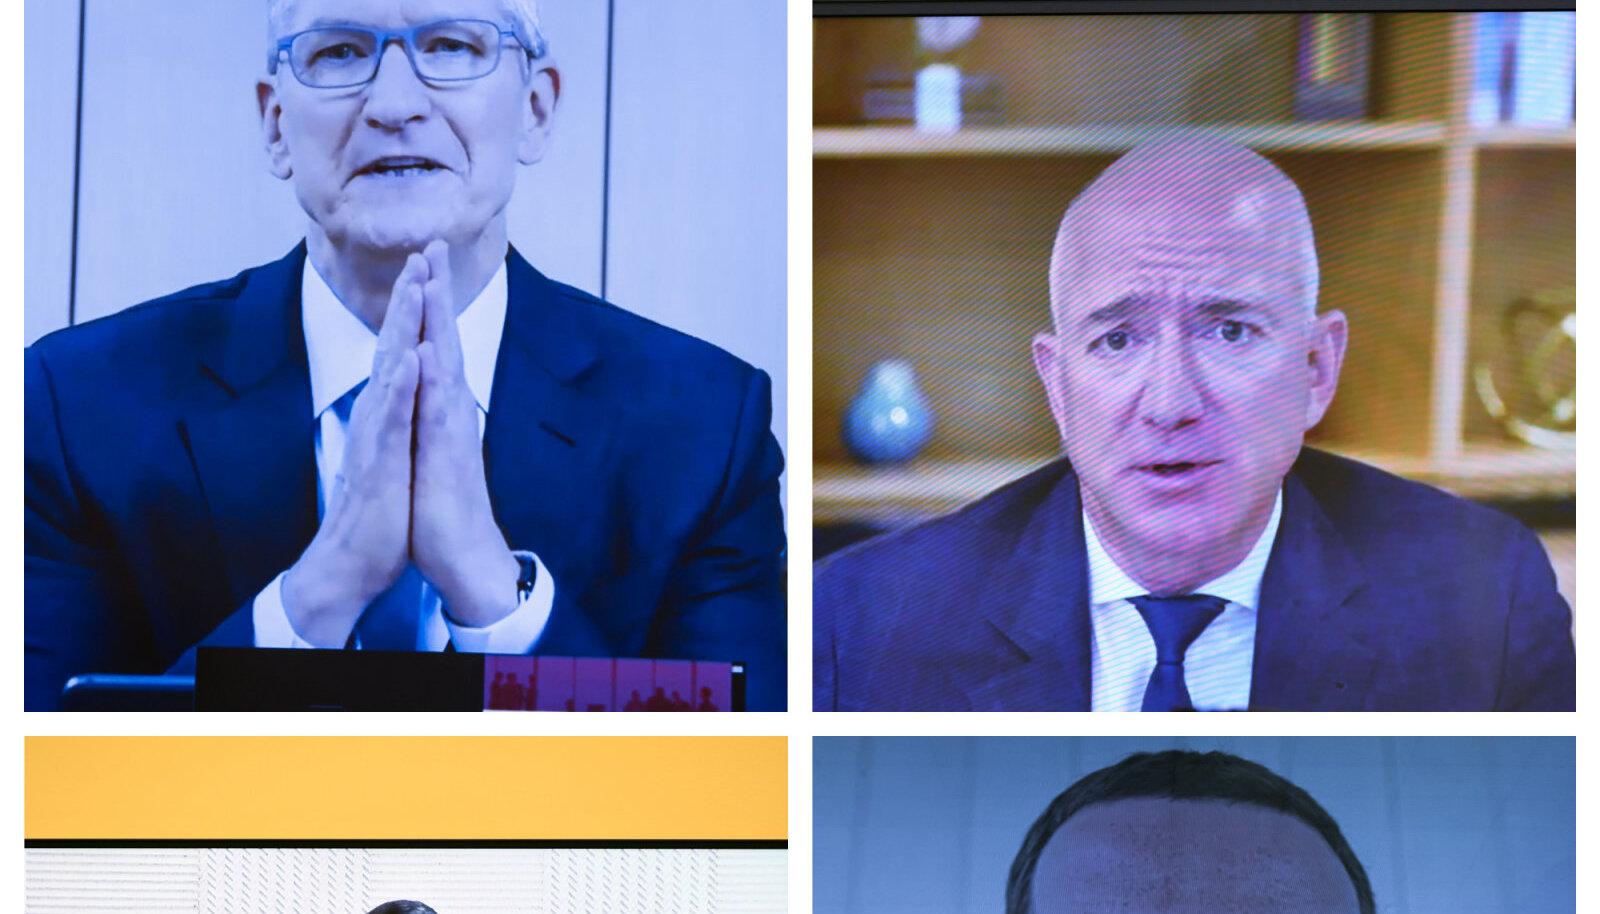 Kollaaž. Üleval vasakul Tim Cook, paremal Jeff Bezos. All vasakul Sundar Pichai, paremal Mark Zuckerberg. Fotod vastavalt: CNP / AdMedia / SIPA, Zumapress.com, AP, Zumapress.com